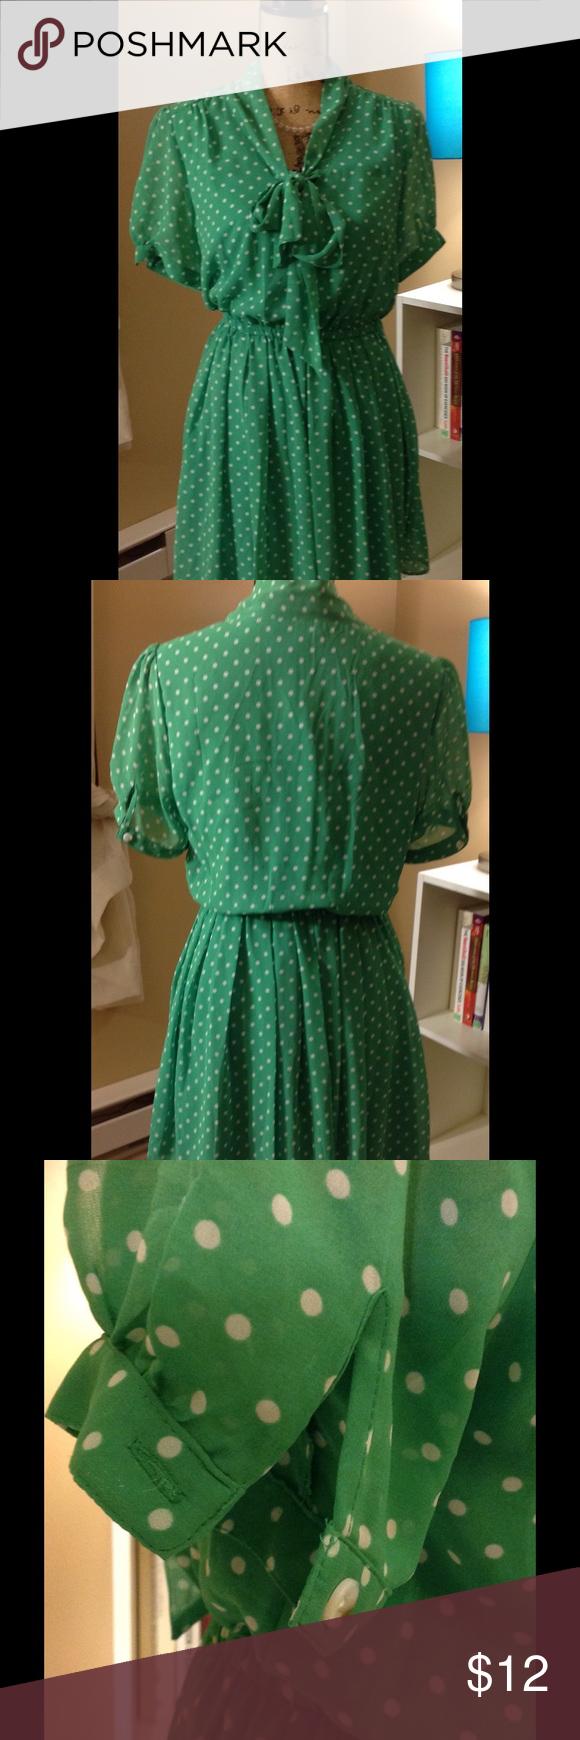 Green Polkadot Dress Green & white Polkadot dress size medium. Forever 21 Dresses Mini